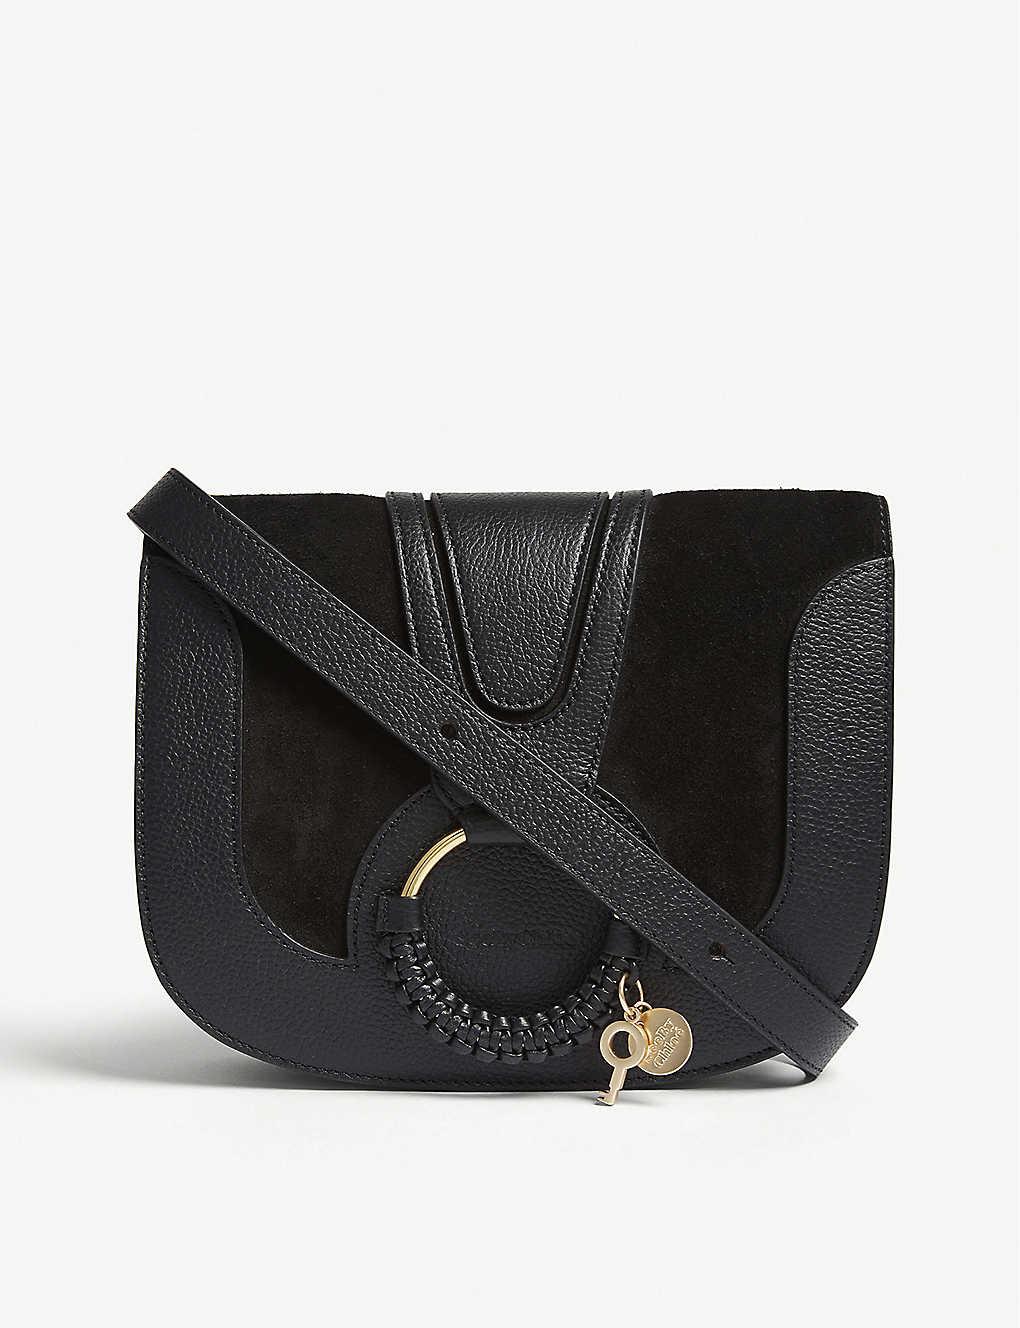 52b2c358022 SEE BY CHLOE - Hoop leather saddle bag | Selfridges.com